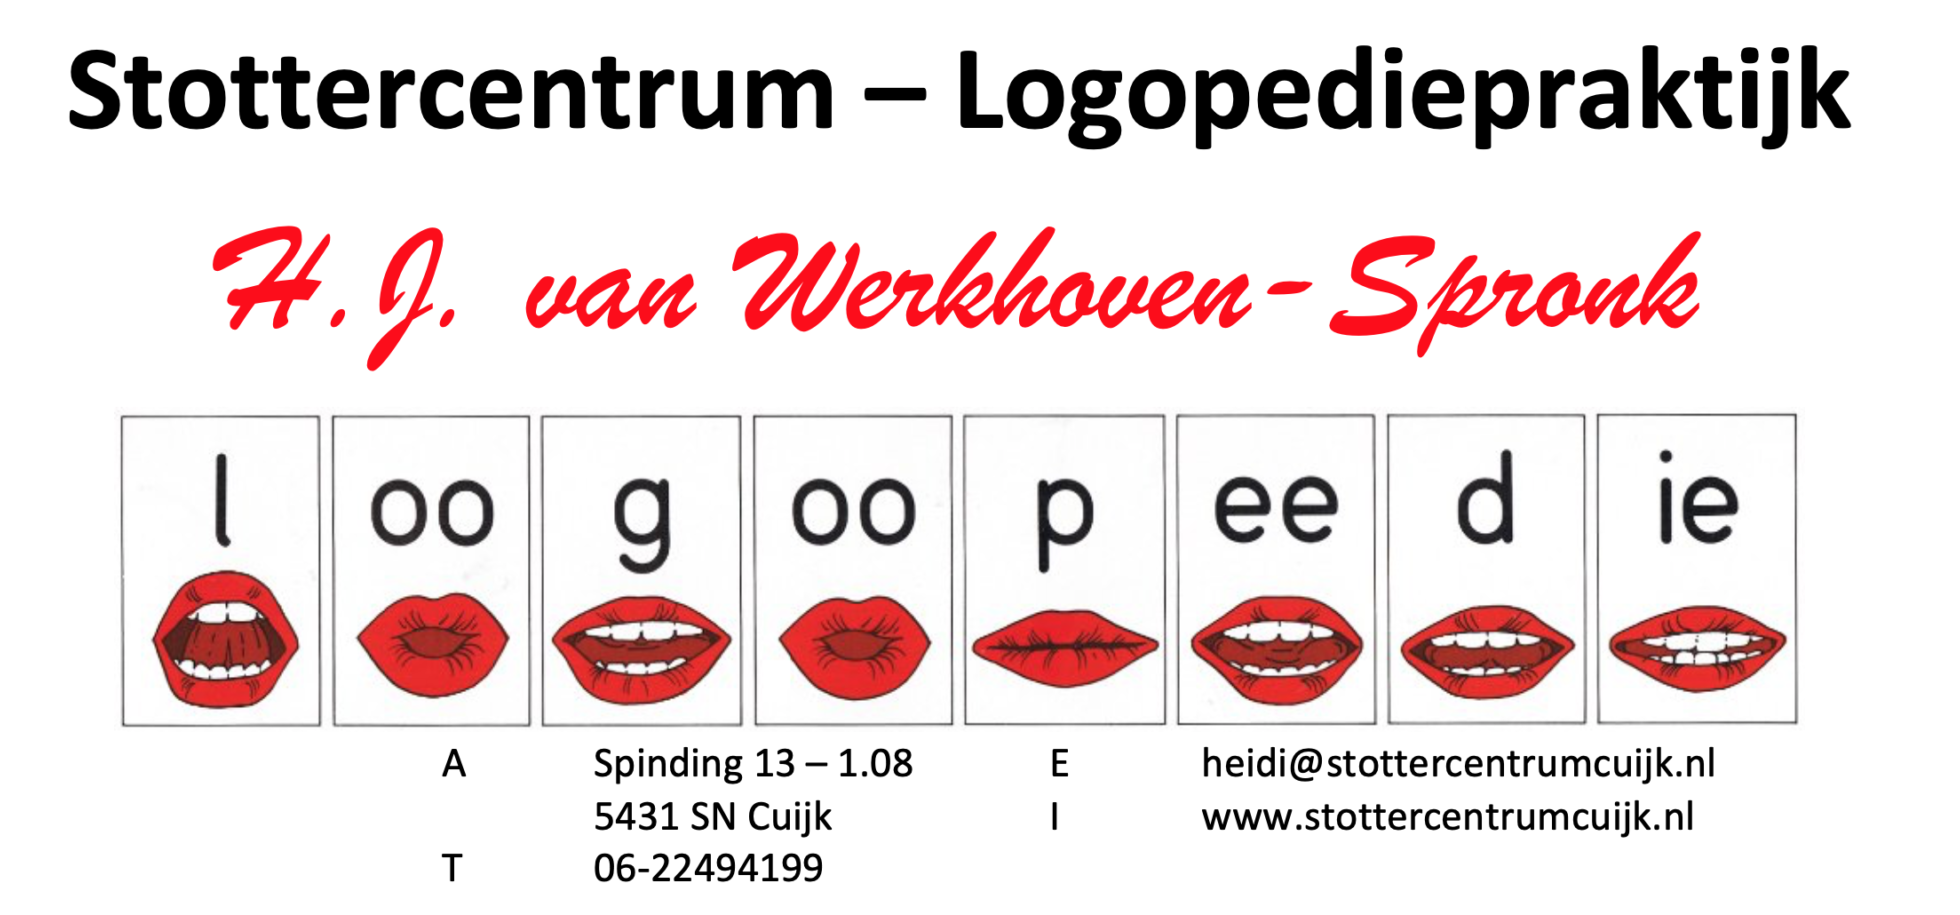 Stottercentrum -Logopediepraktijk Cuijk